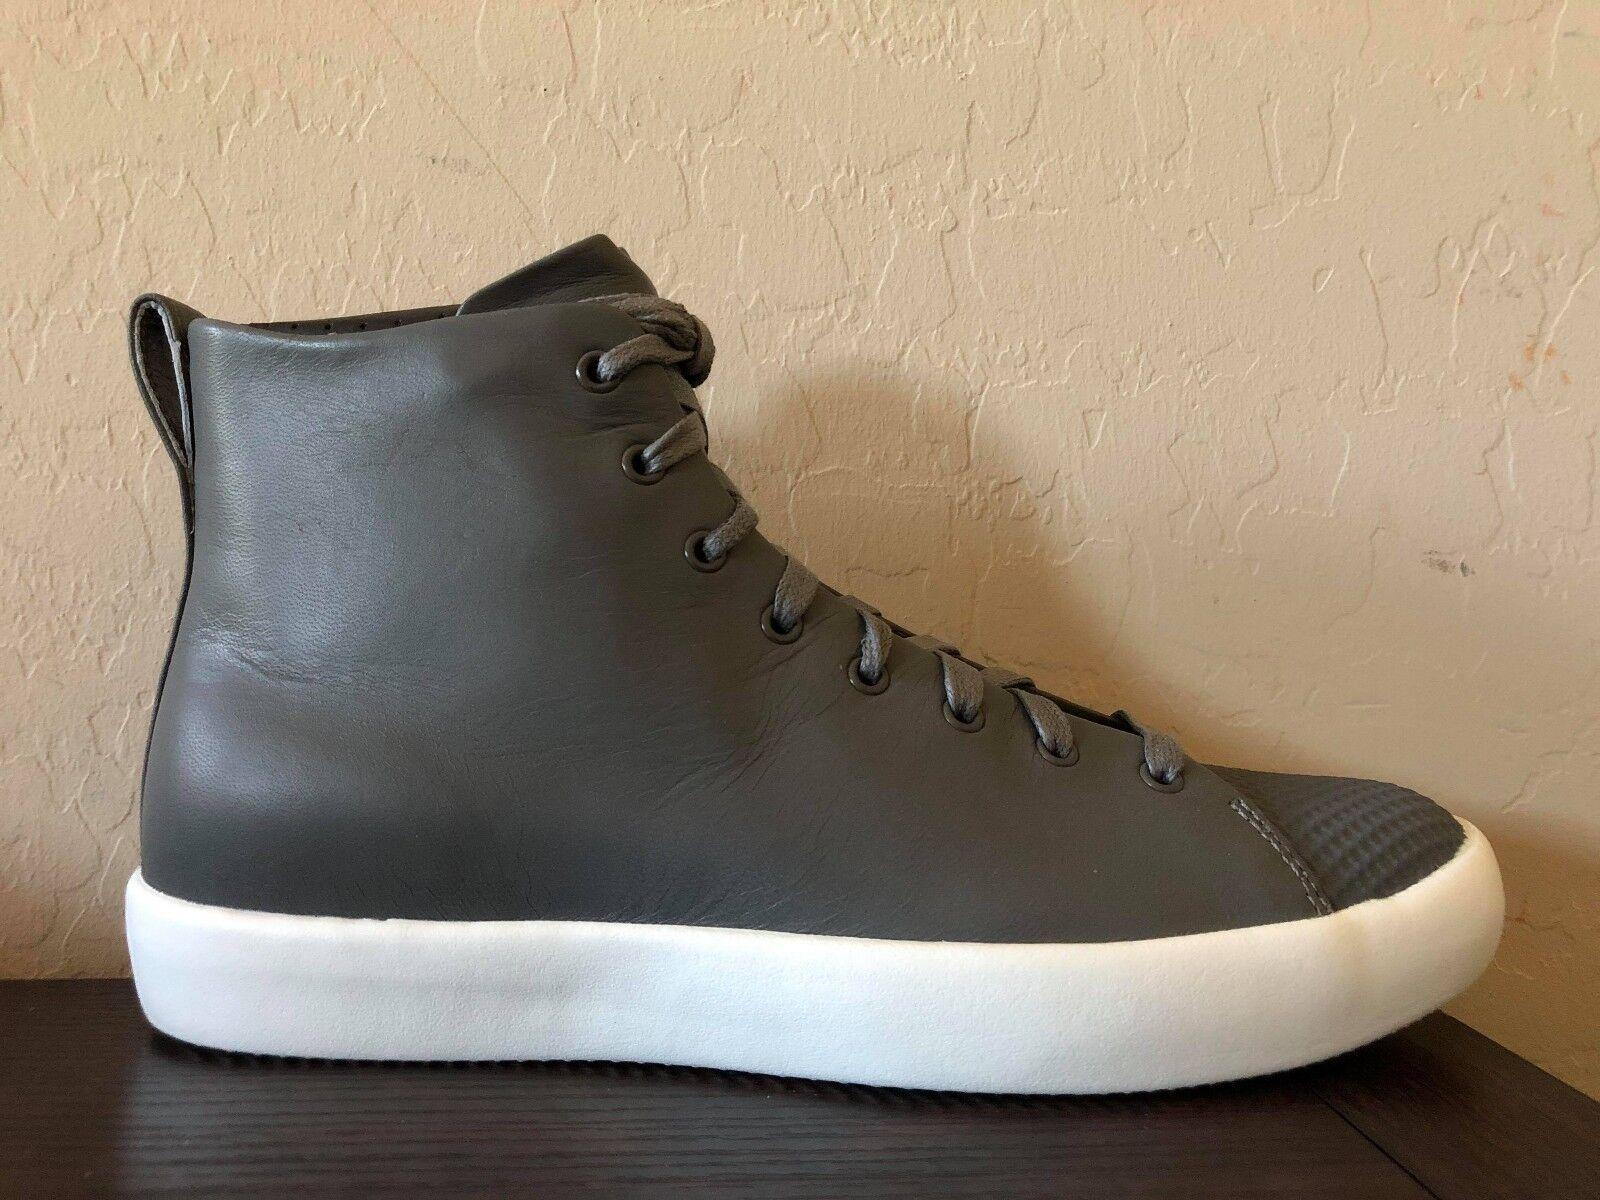 Converse Chuck Taylor ALL STAR MODERN HI SHOES size 9 $140 CHARCOAL GREY Scarpe classiche da uomo